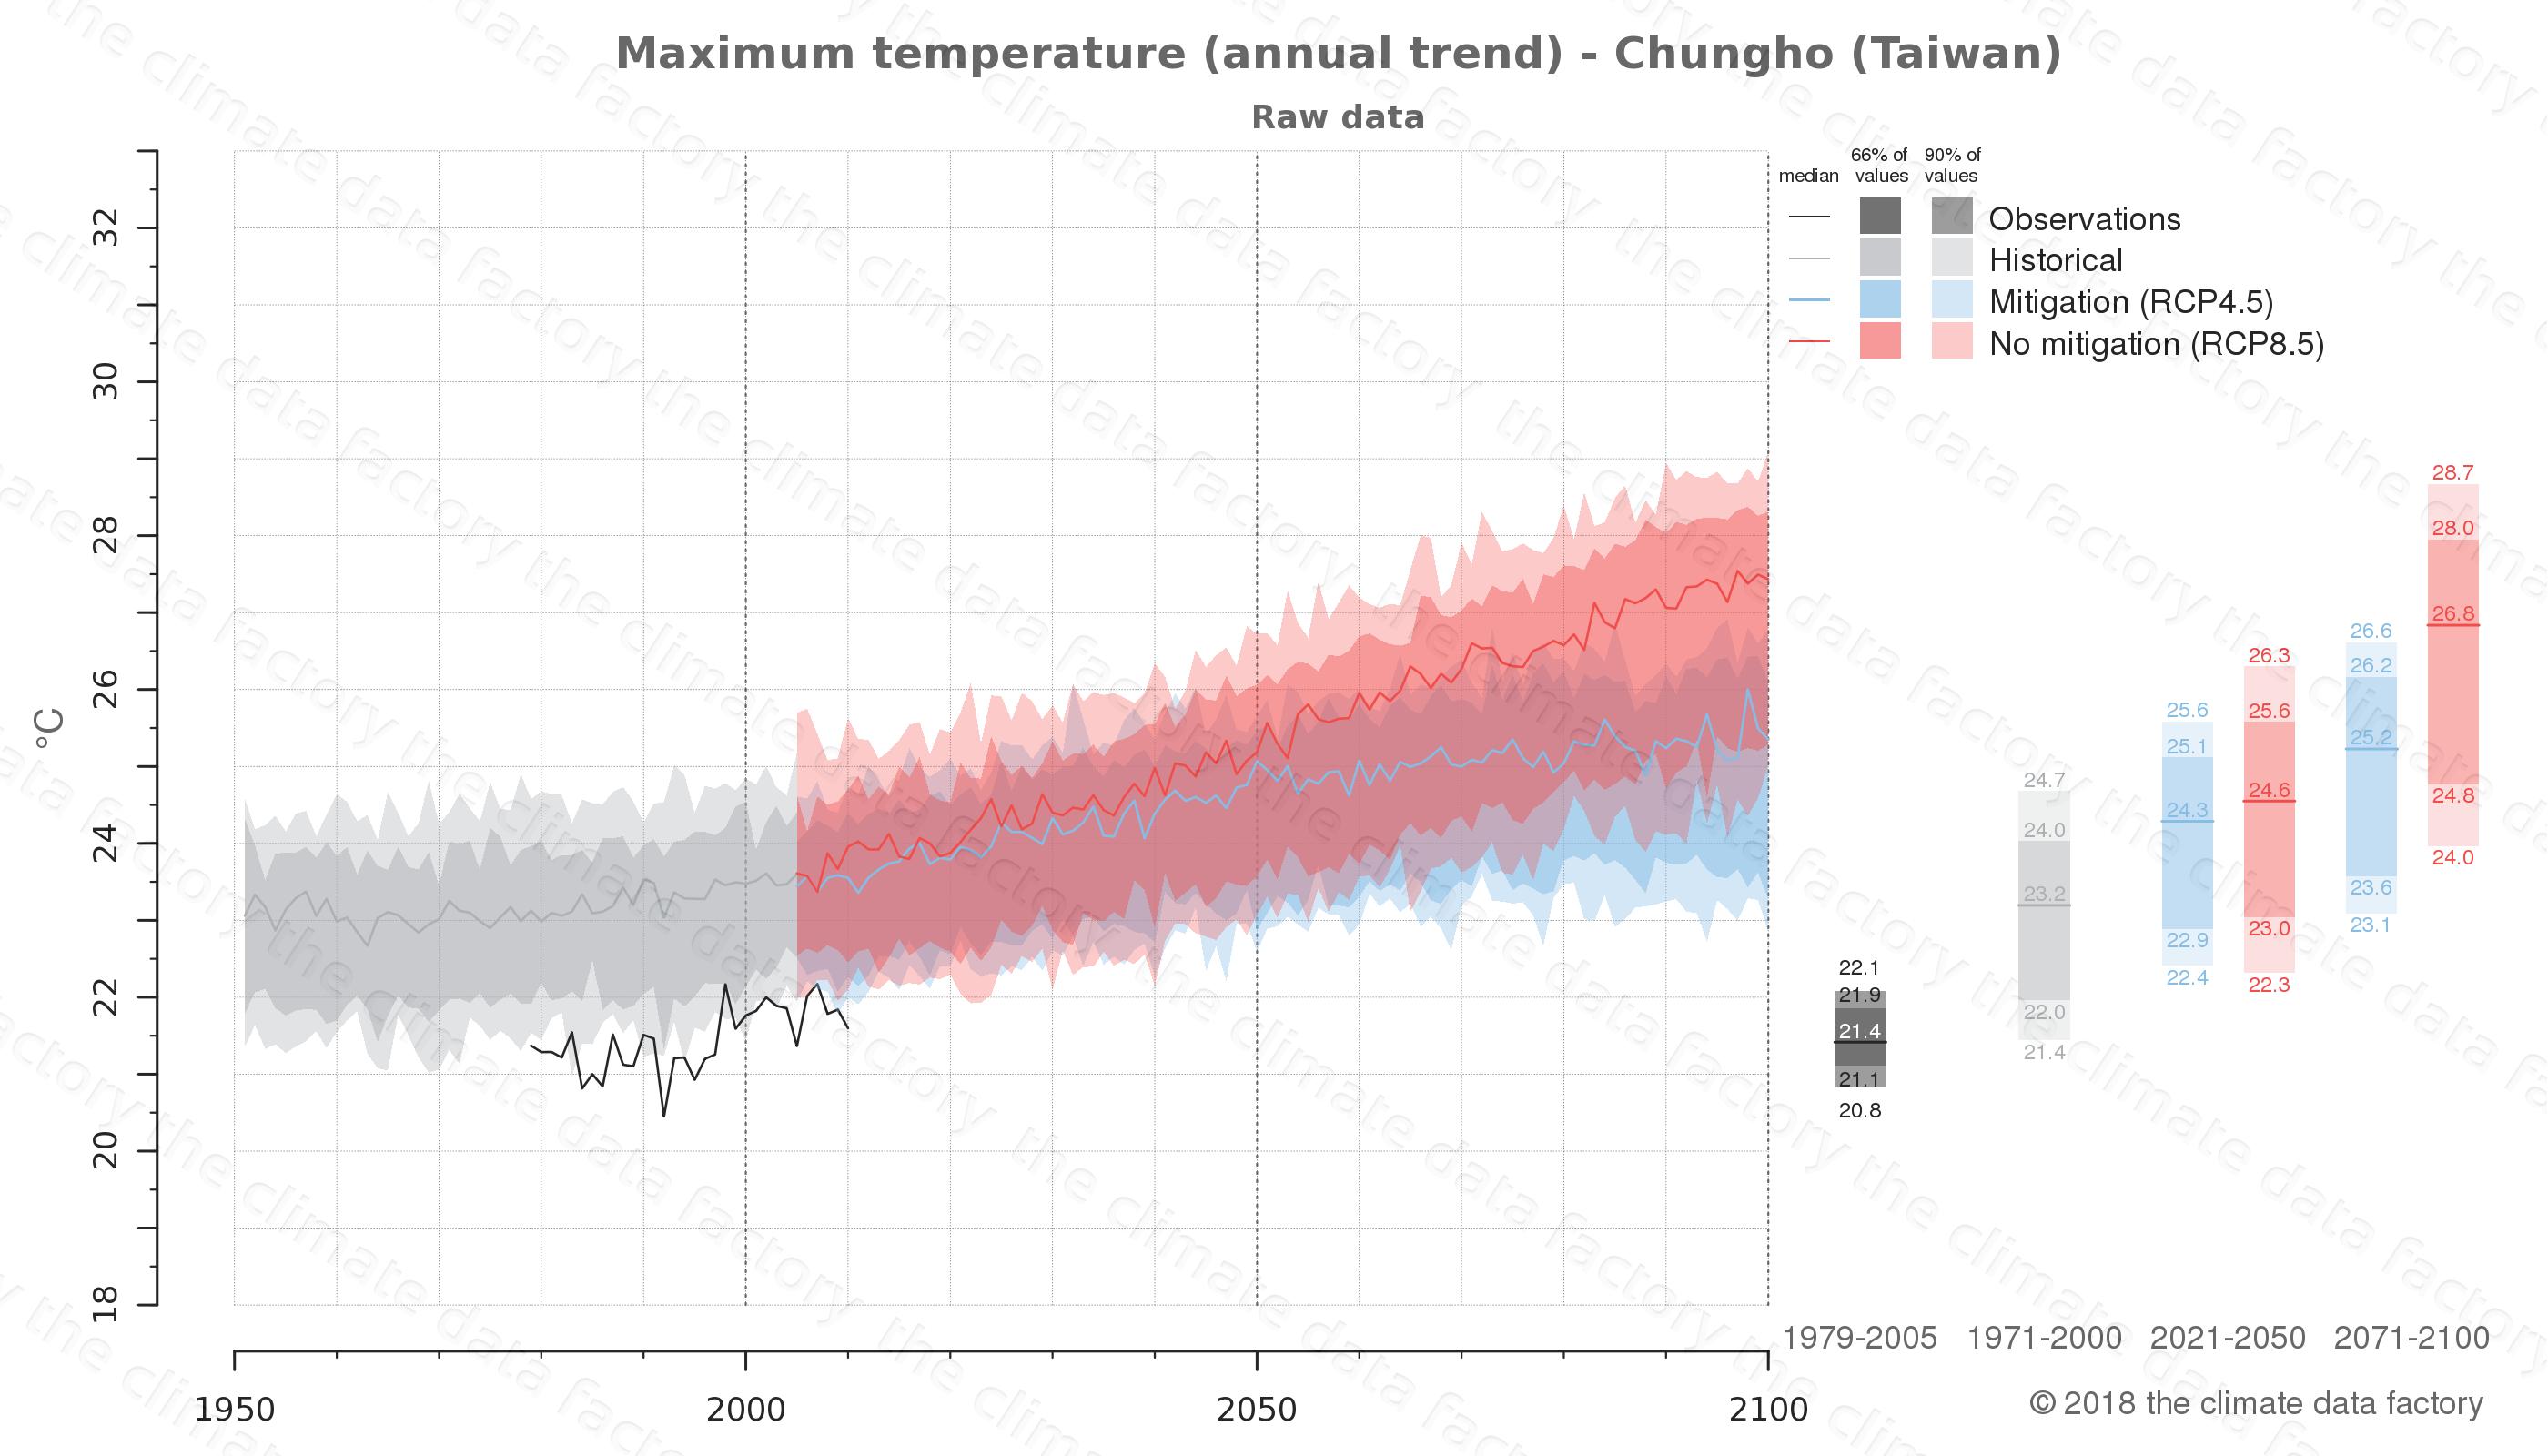 climate change data policy adaptation climate graph city data maximum-temperature chungho taiwan